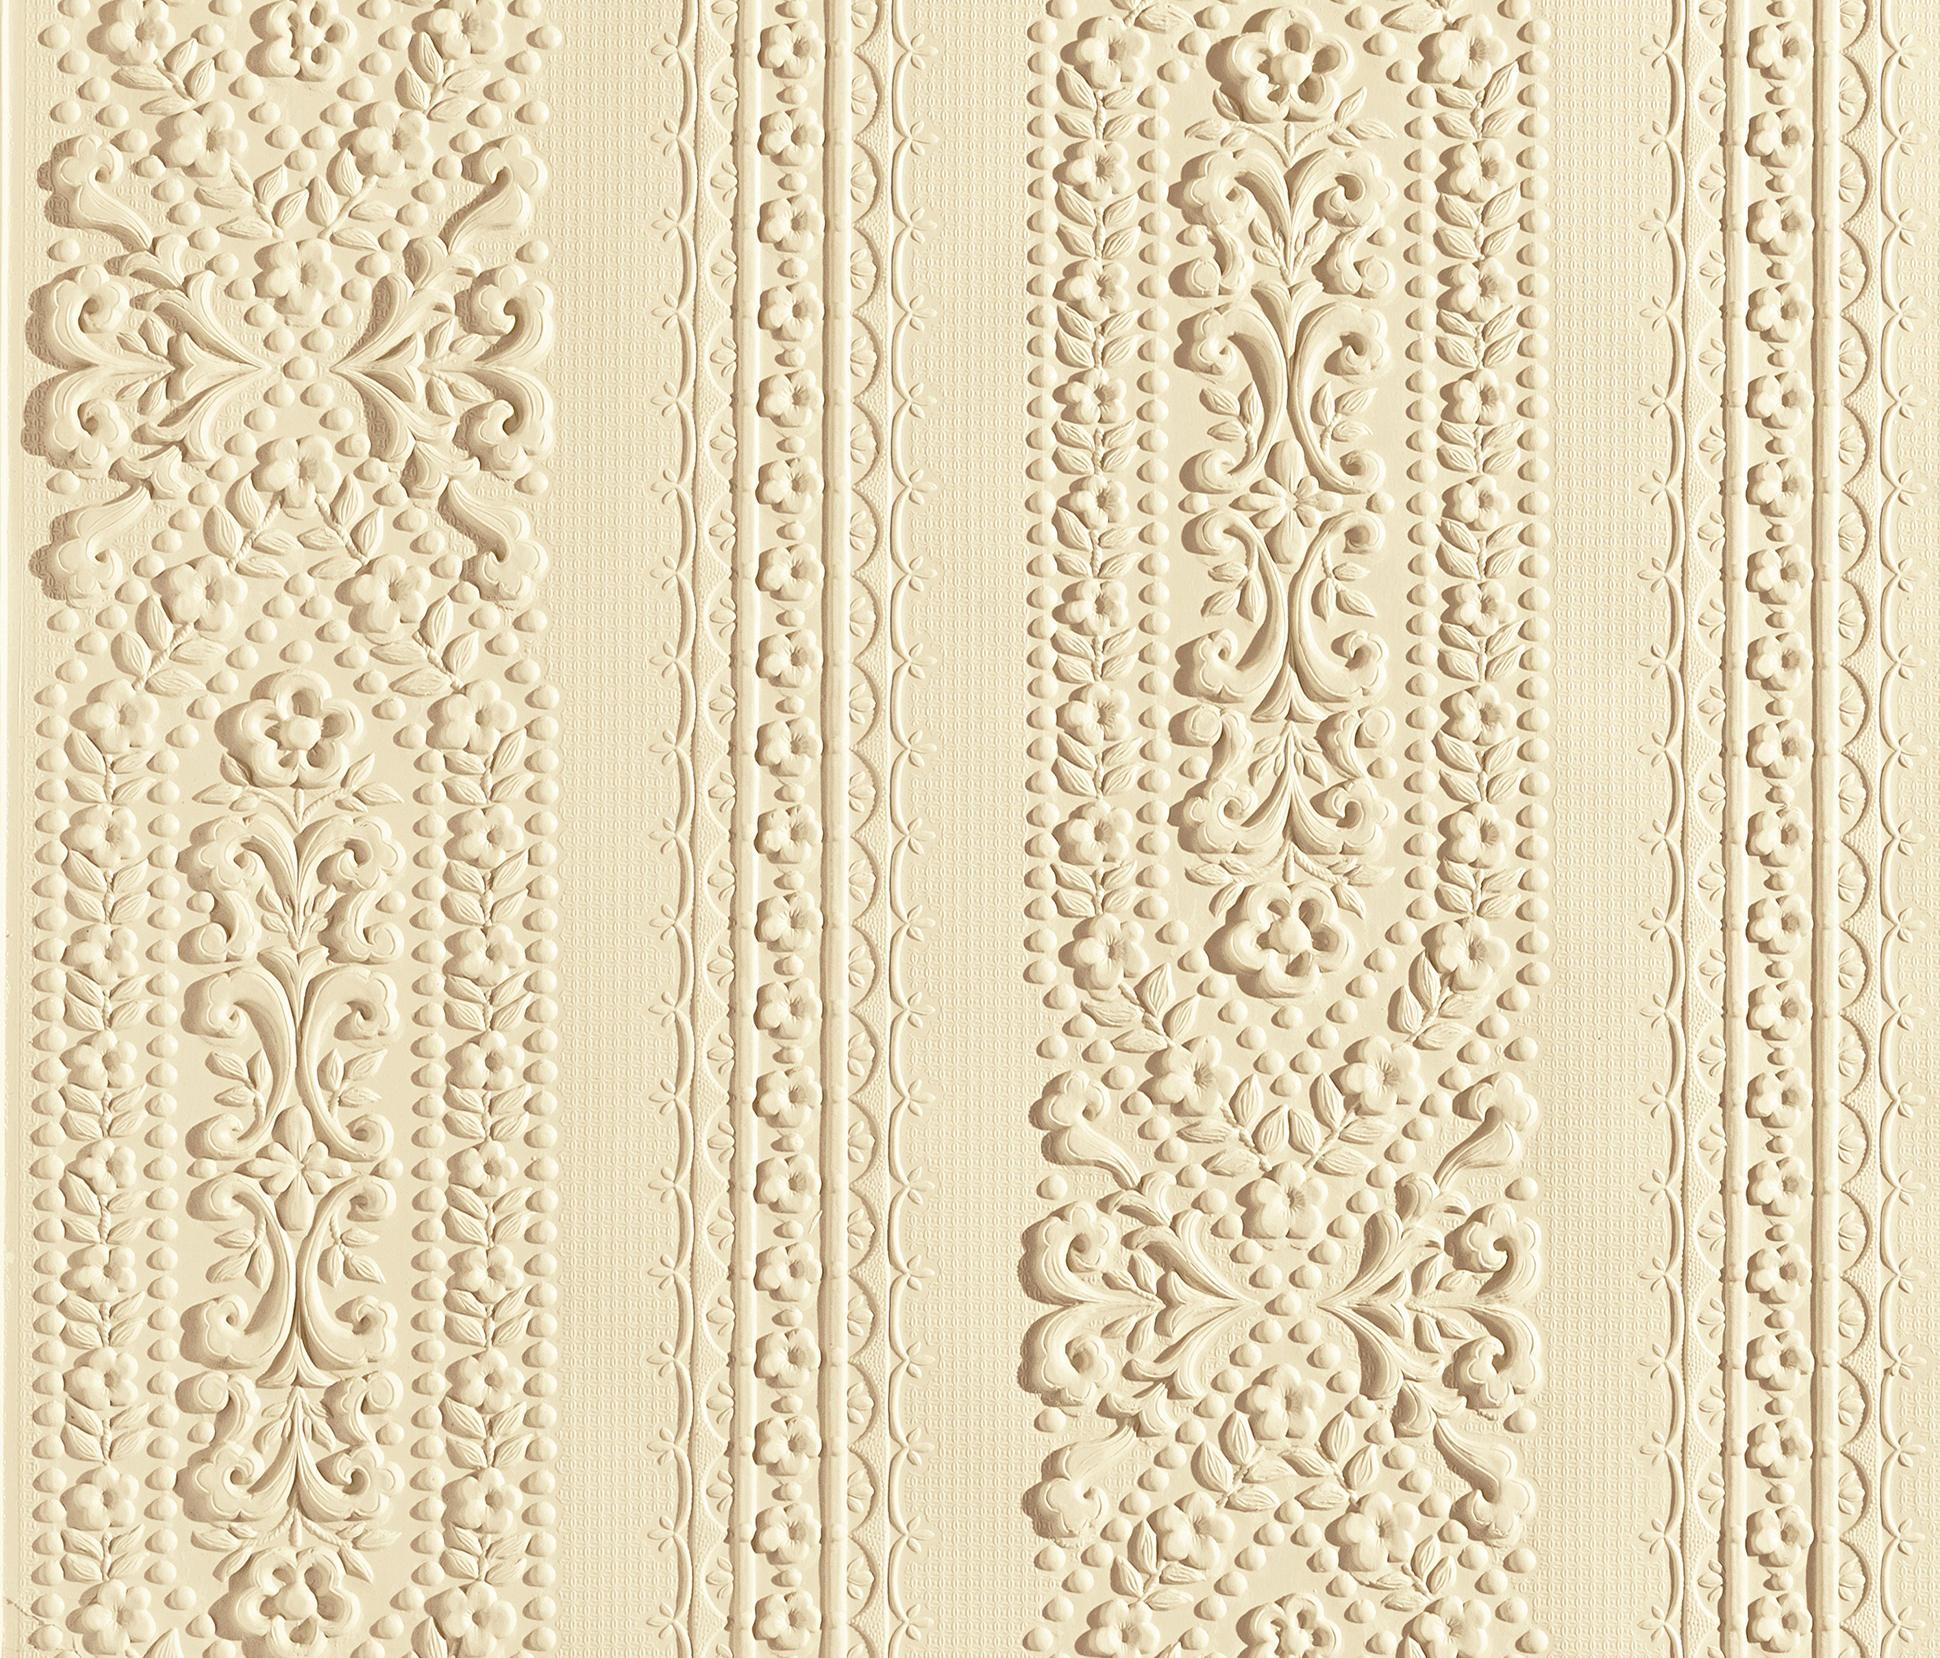 seville dado - tissus de décoration de lincrusta | architonic